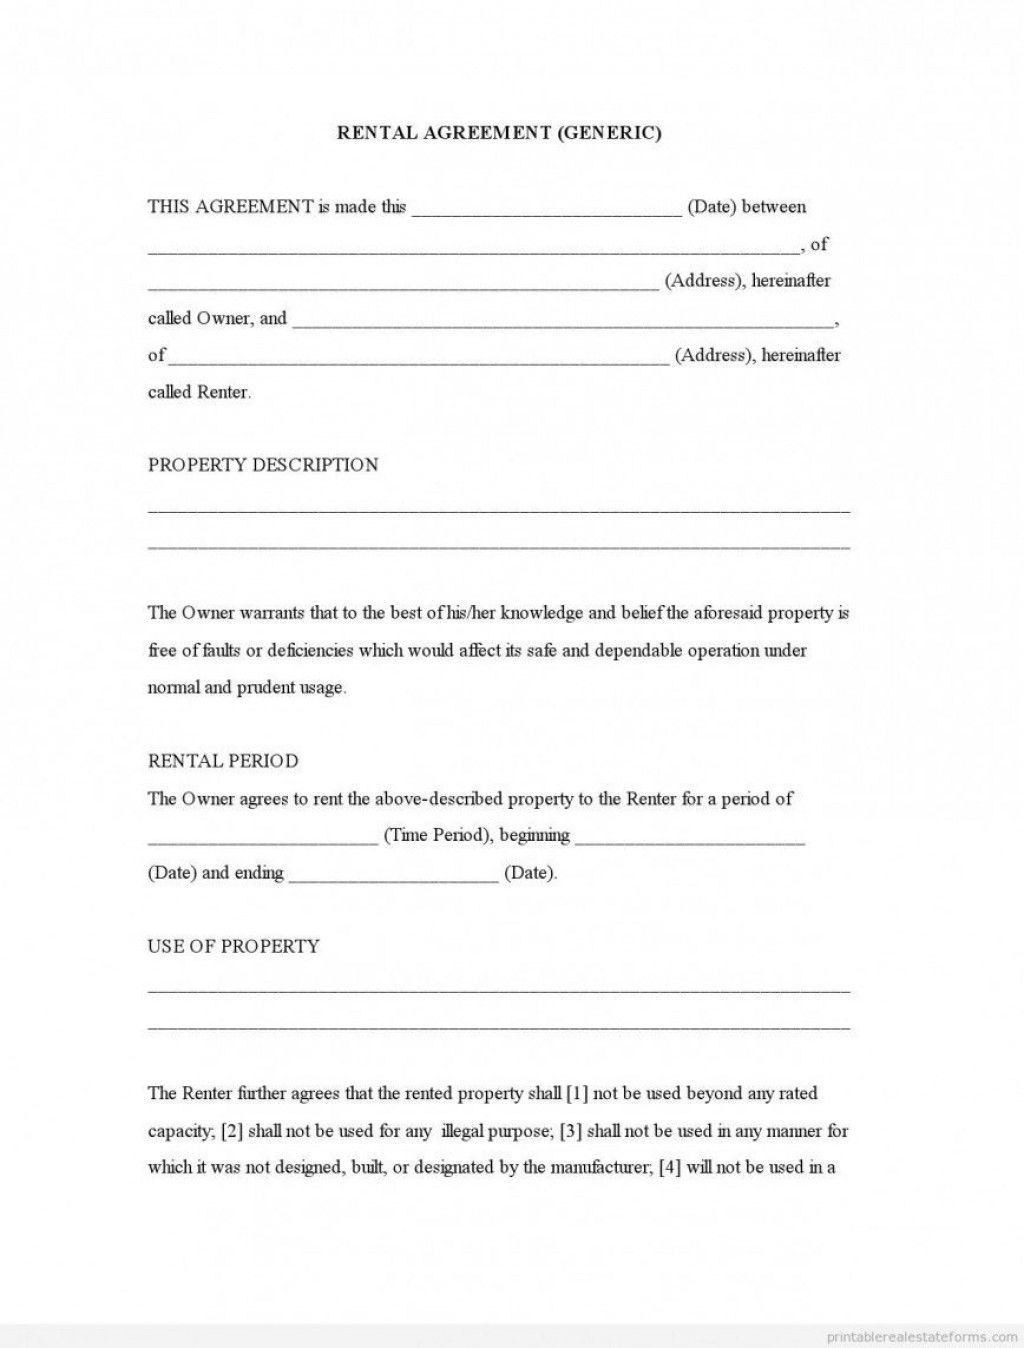 002 Fascinating Rental Agreement Contract Free Download Example  Tenancy Form Uk House EquipmentLarge